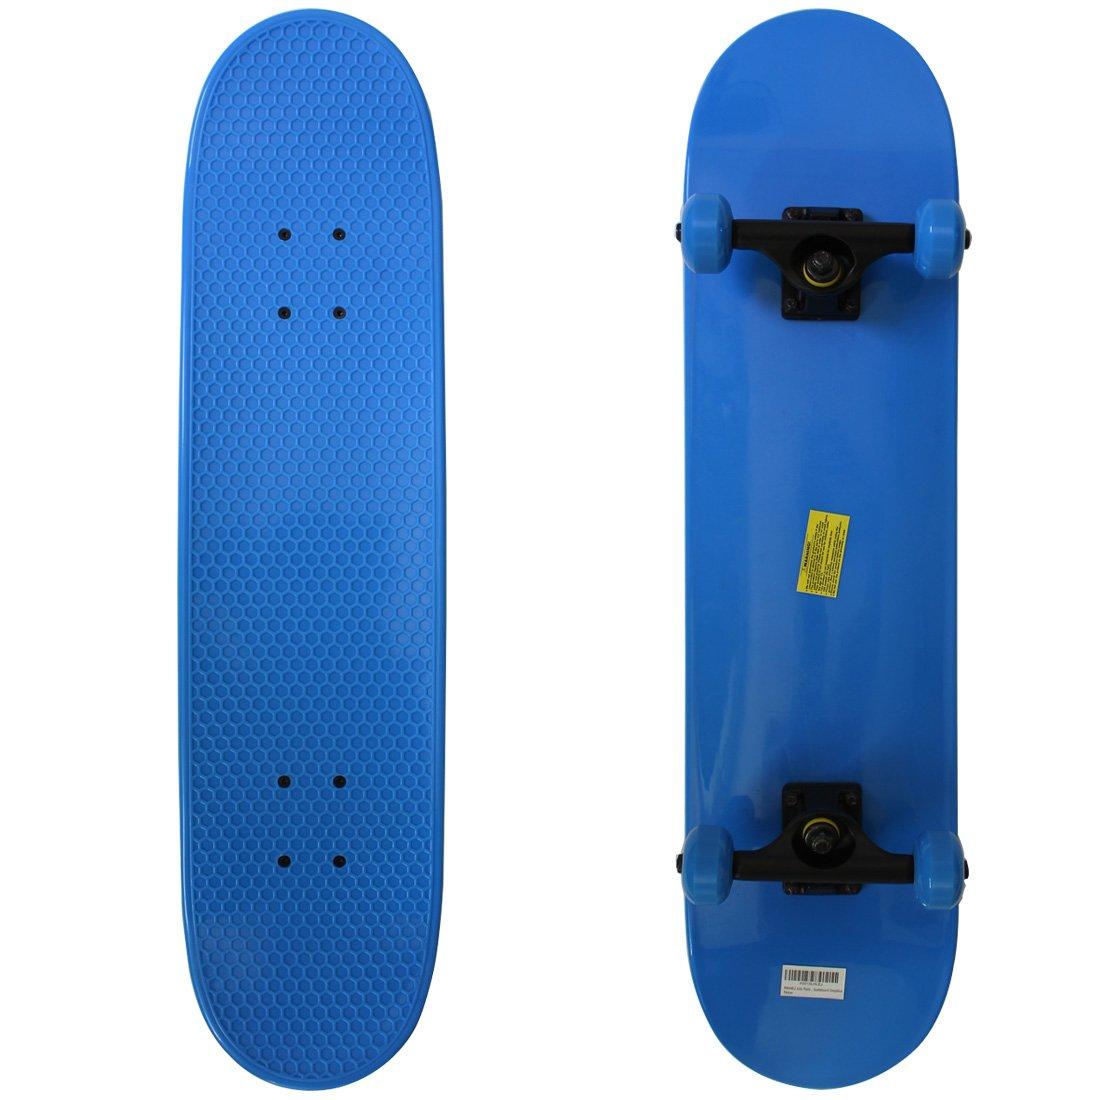 RIMABLE Kids Plastic Complete Skateboard Deepblue